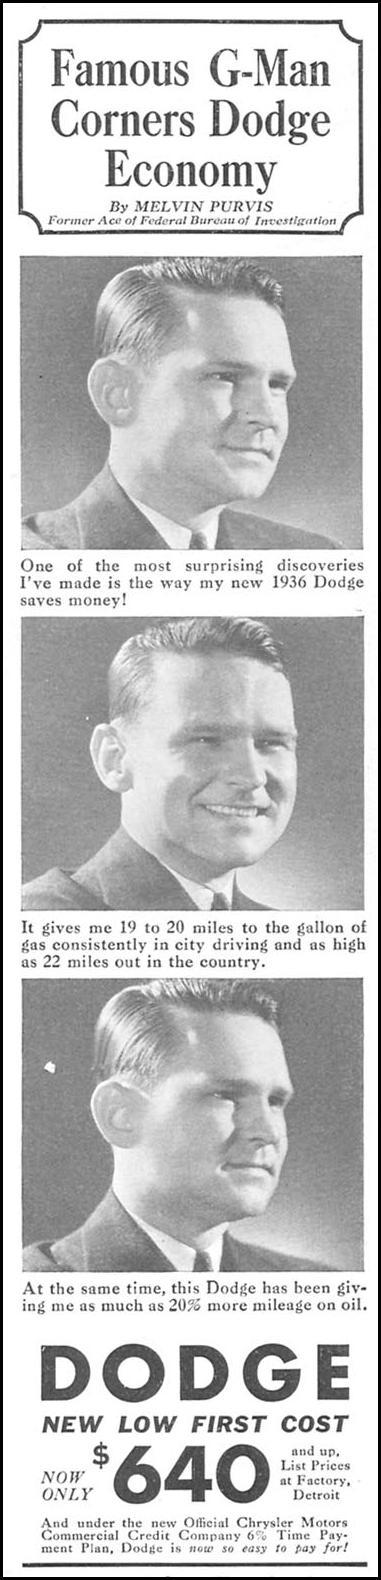 DODGE AUTOMOBILES GOOD HOUSEKEEPING 04/01/1936 p. 198